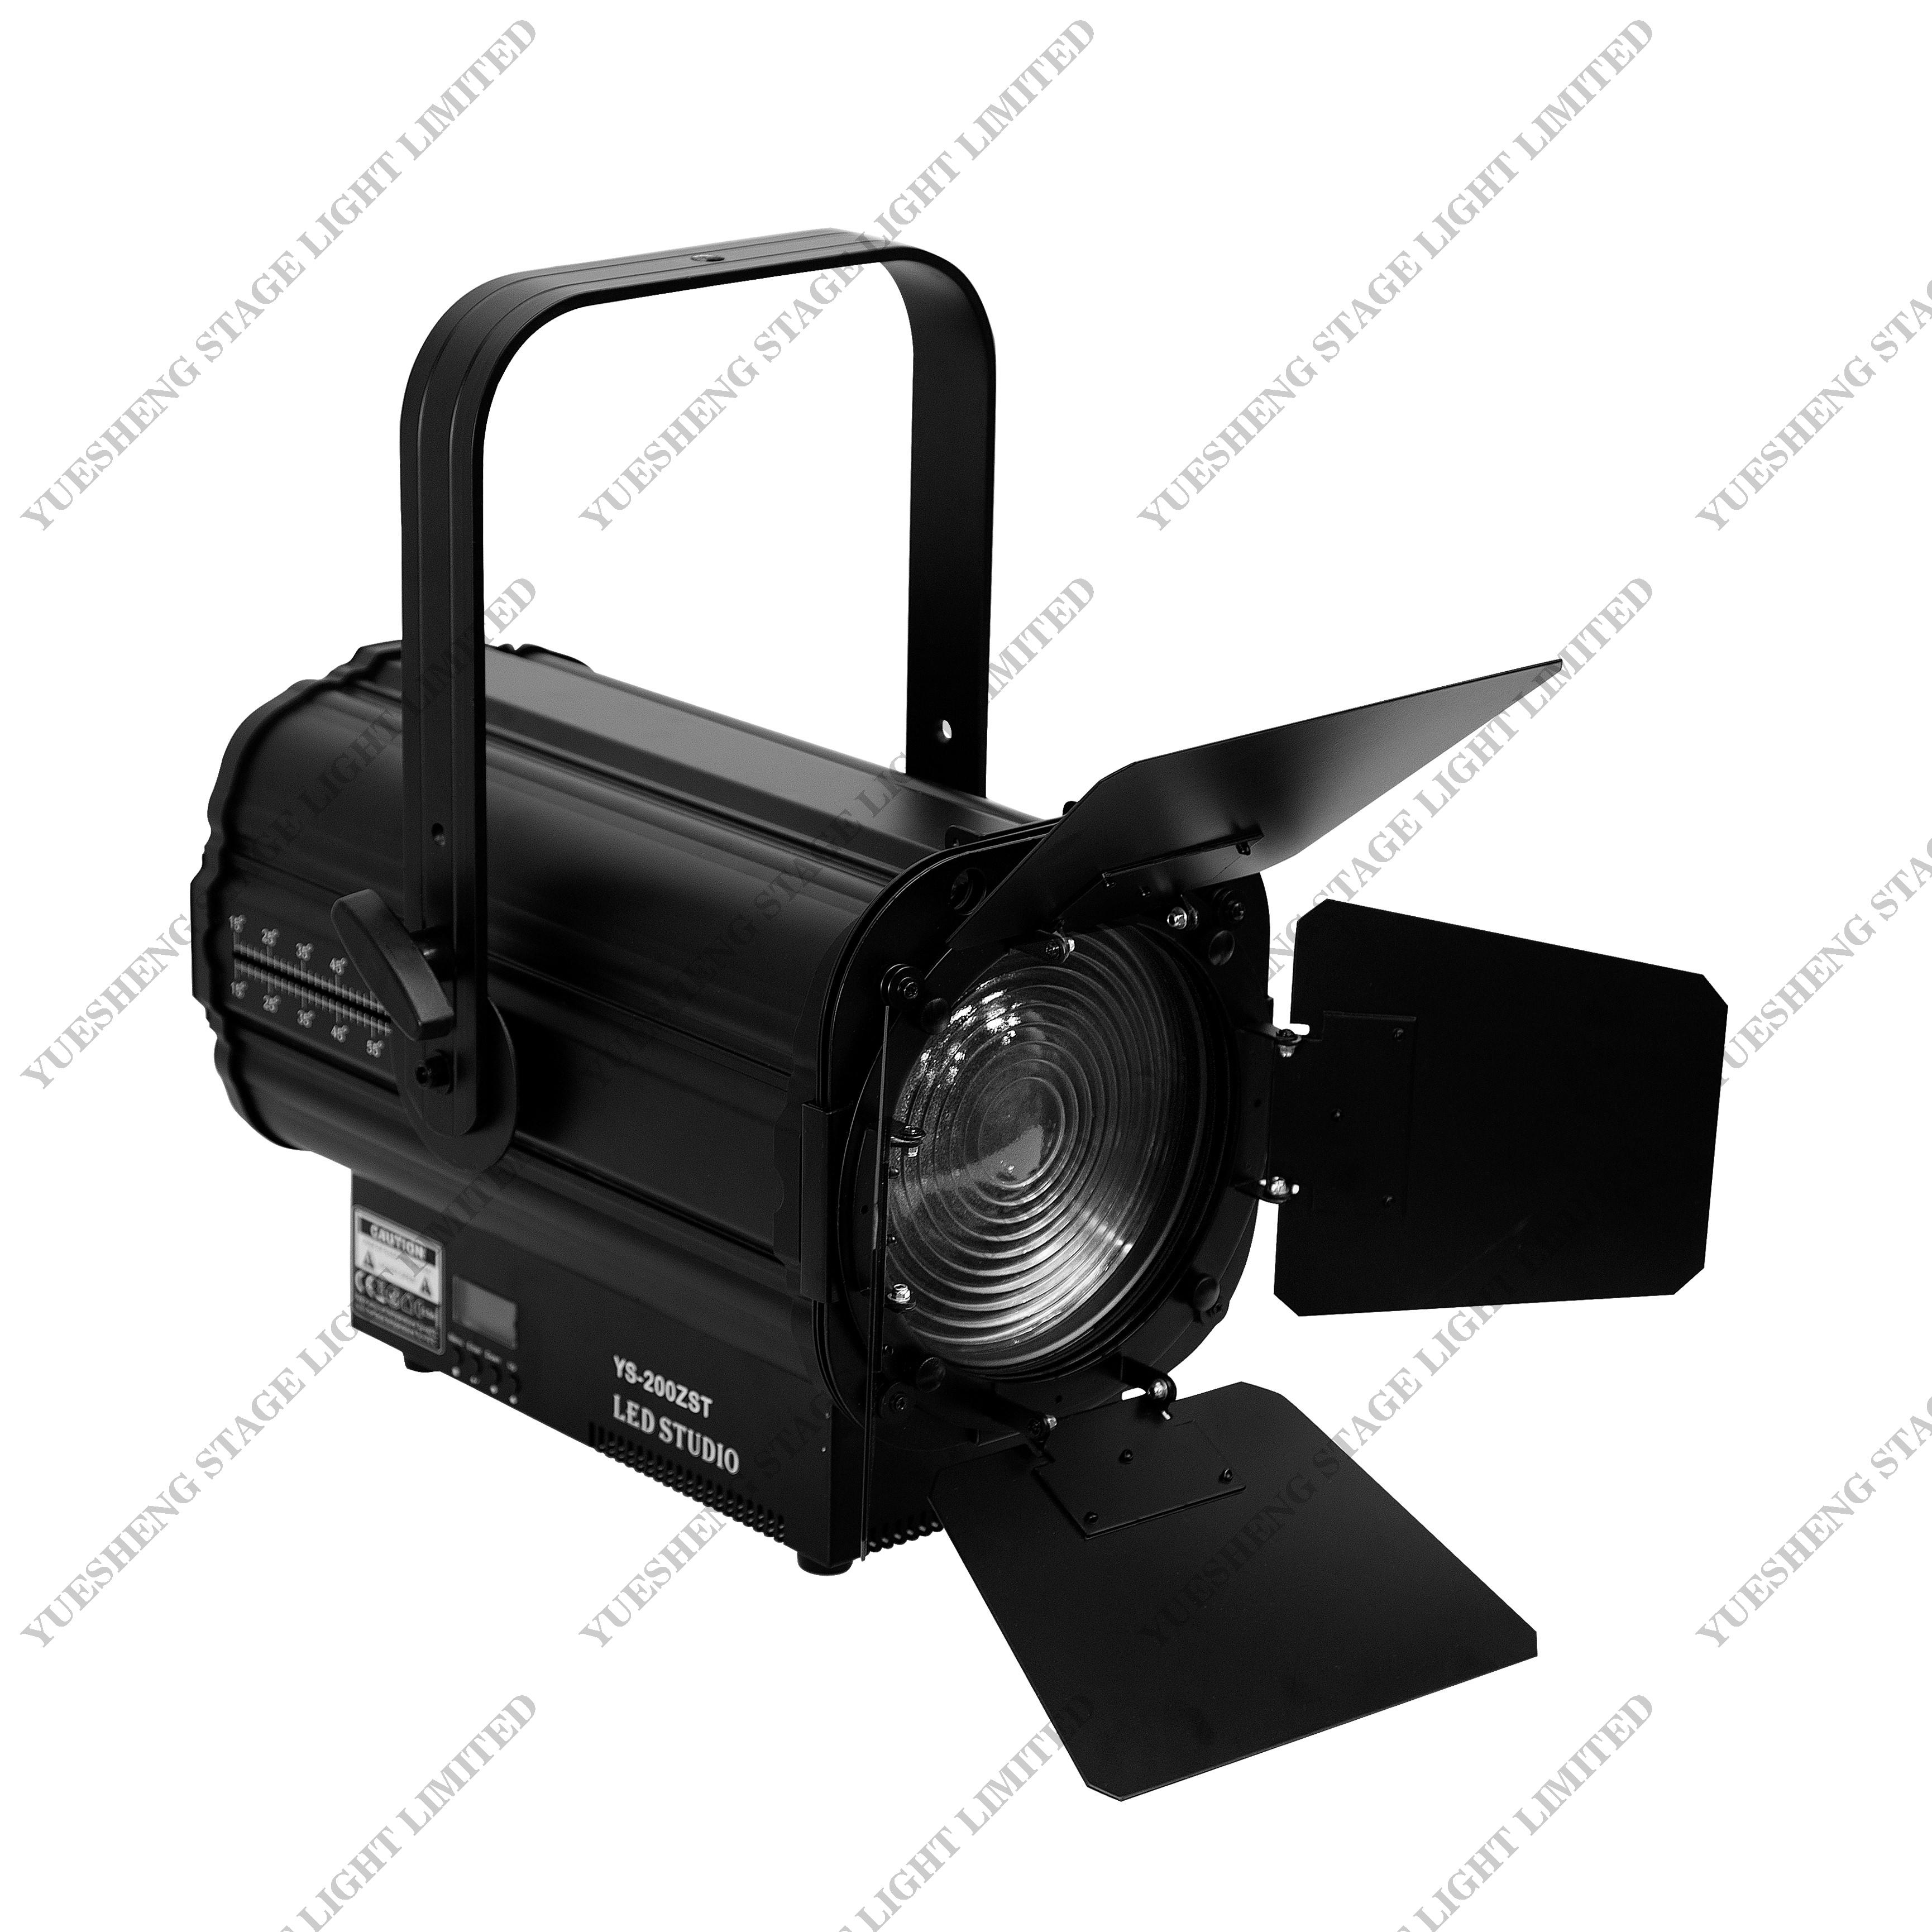 Best Quality 200w White Led Professional Dmx Stage Light Fresnel Spot Light